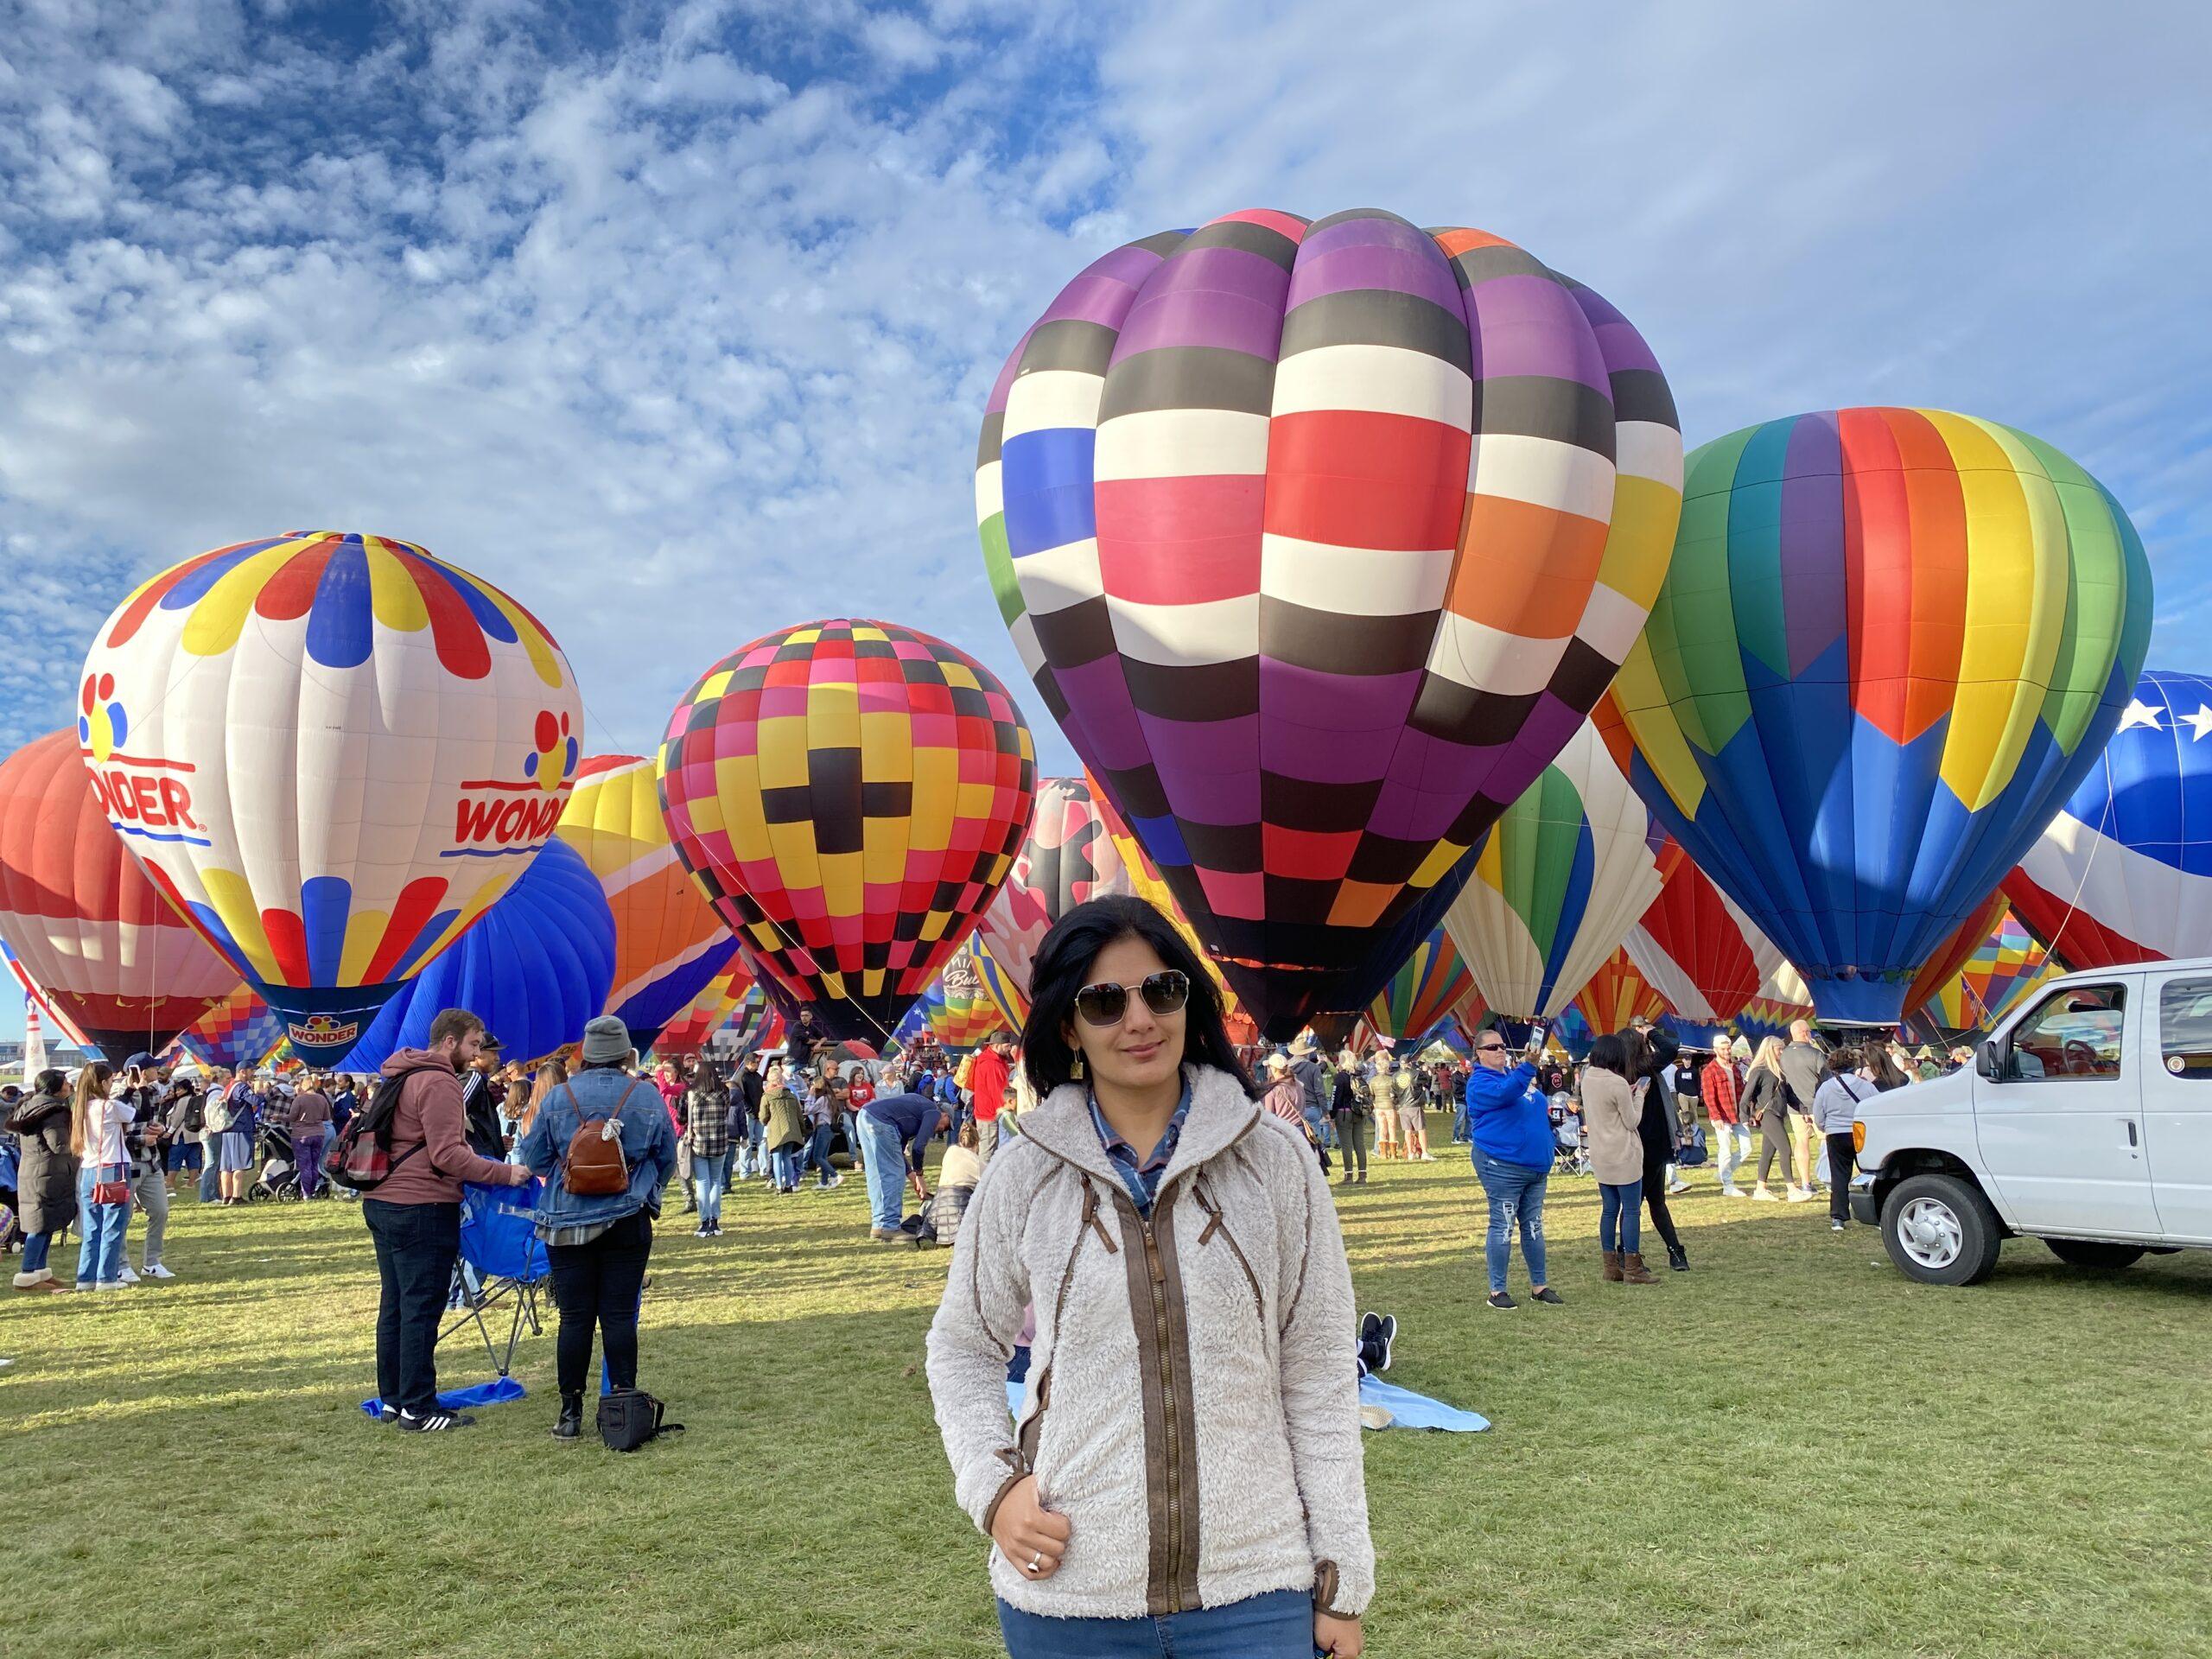 7 Fun Things To Do in Albuquerque, New Mexico